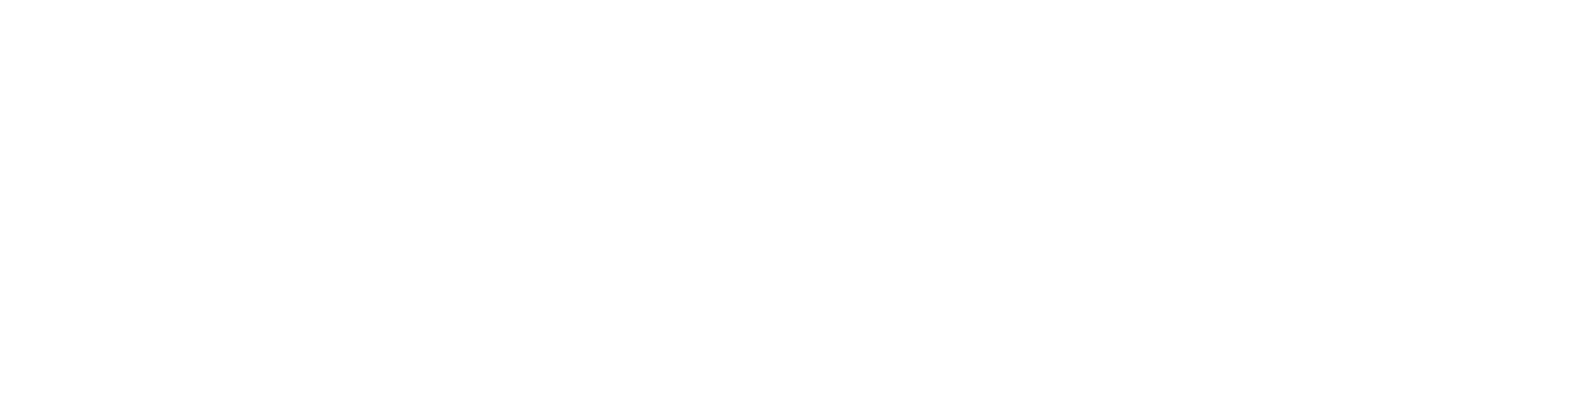 Bayside Bullion